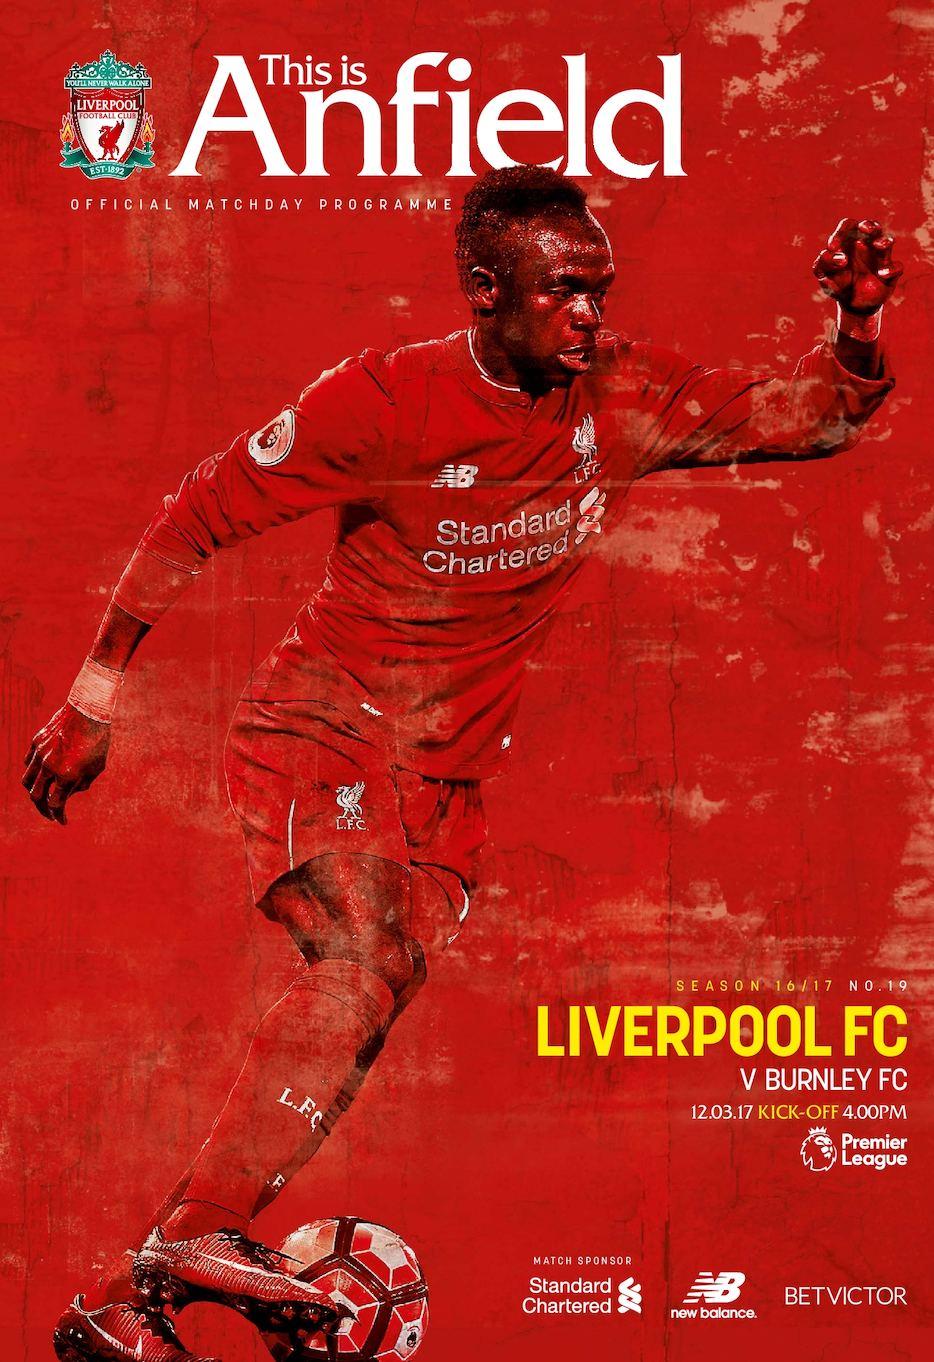 Liverpool FC v Burnley FC programme